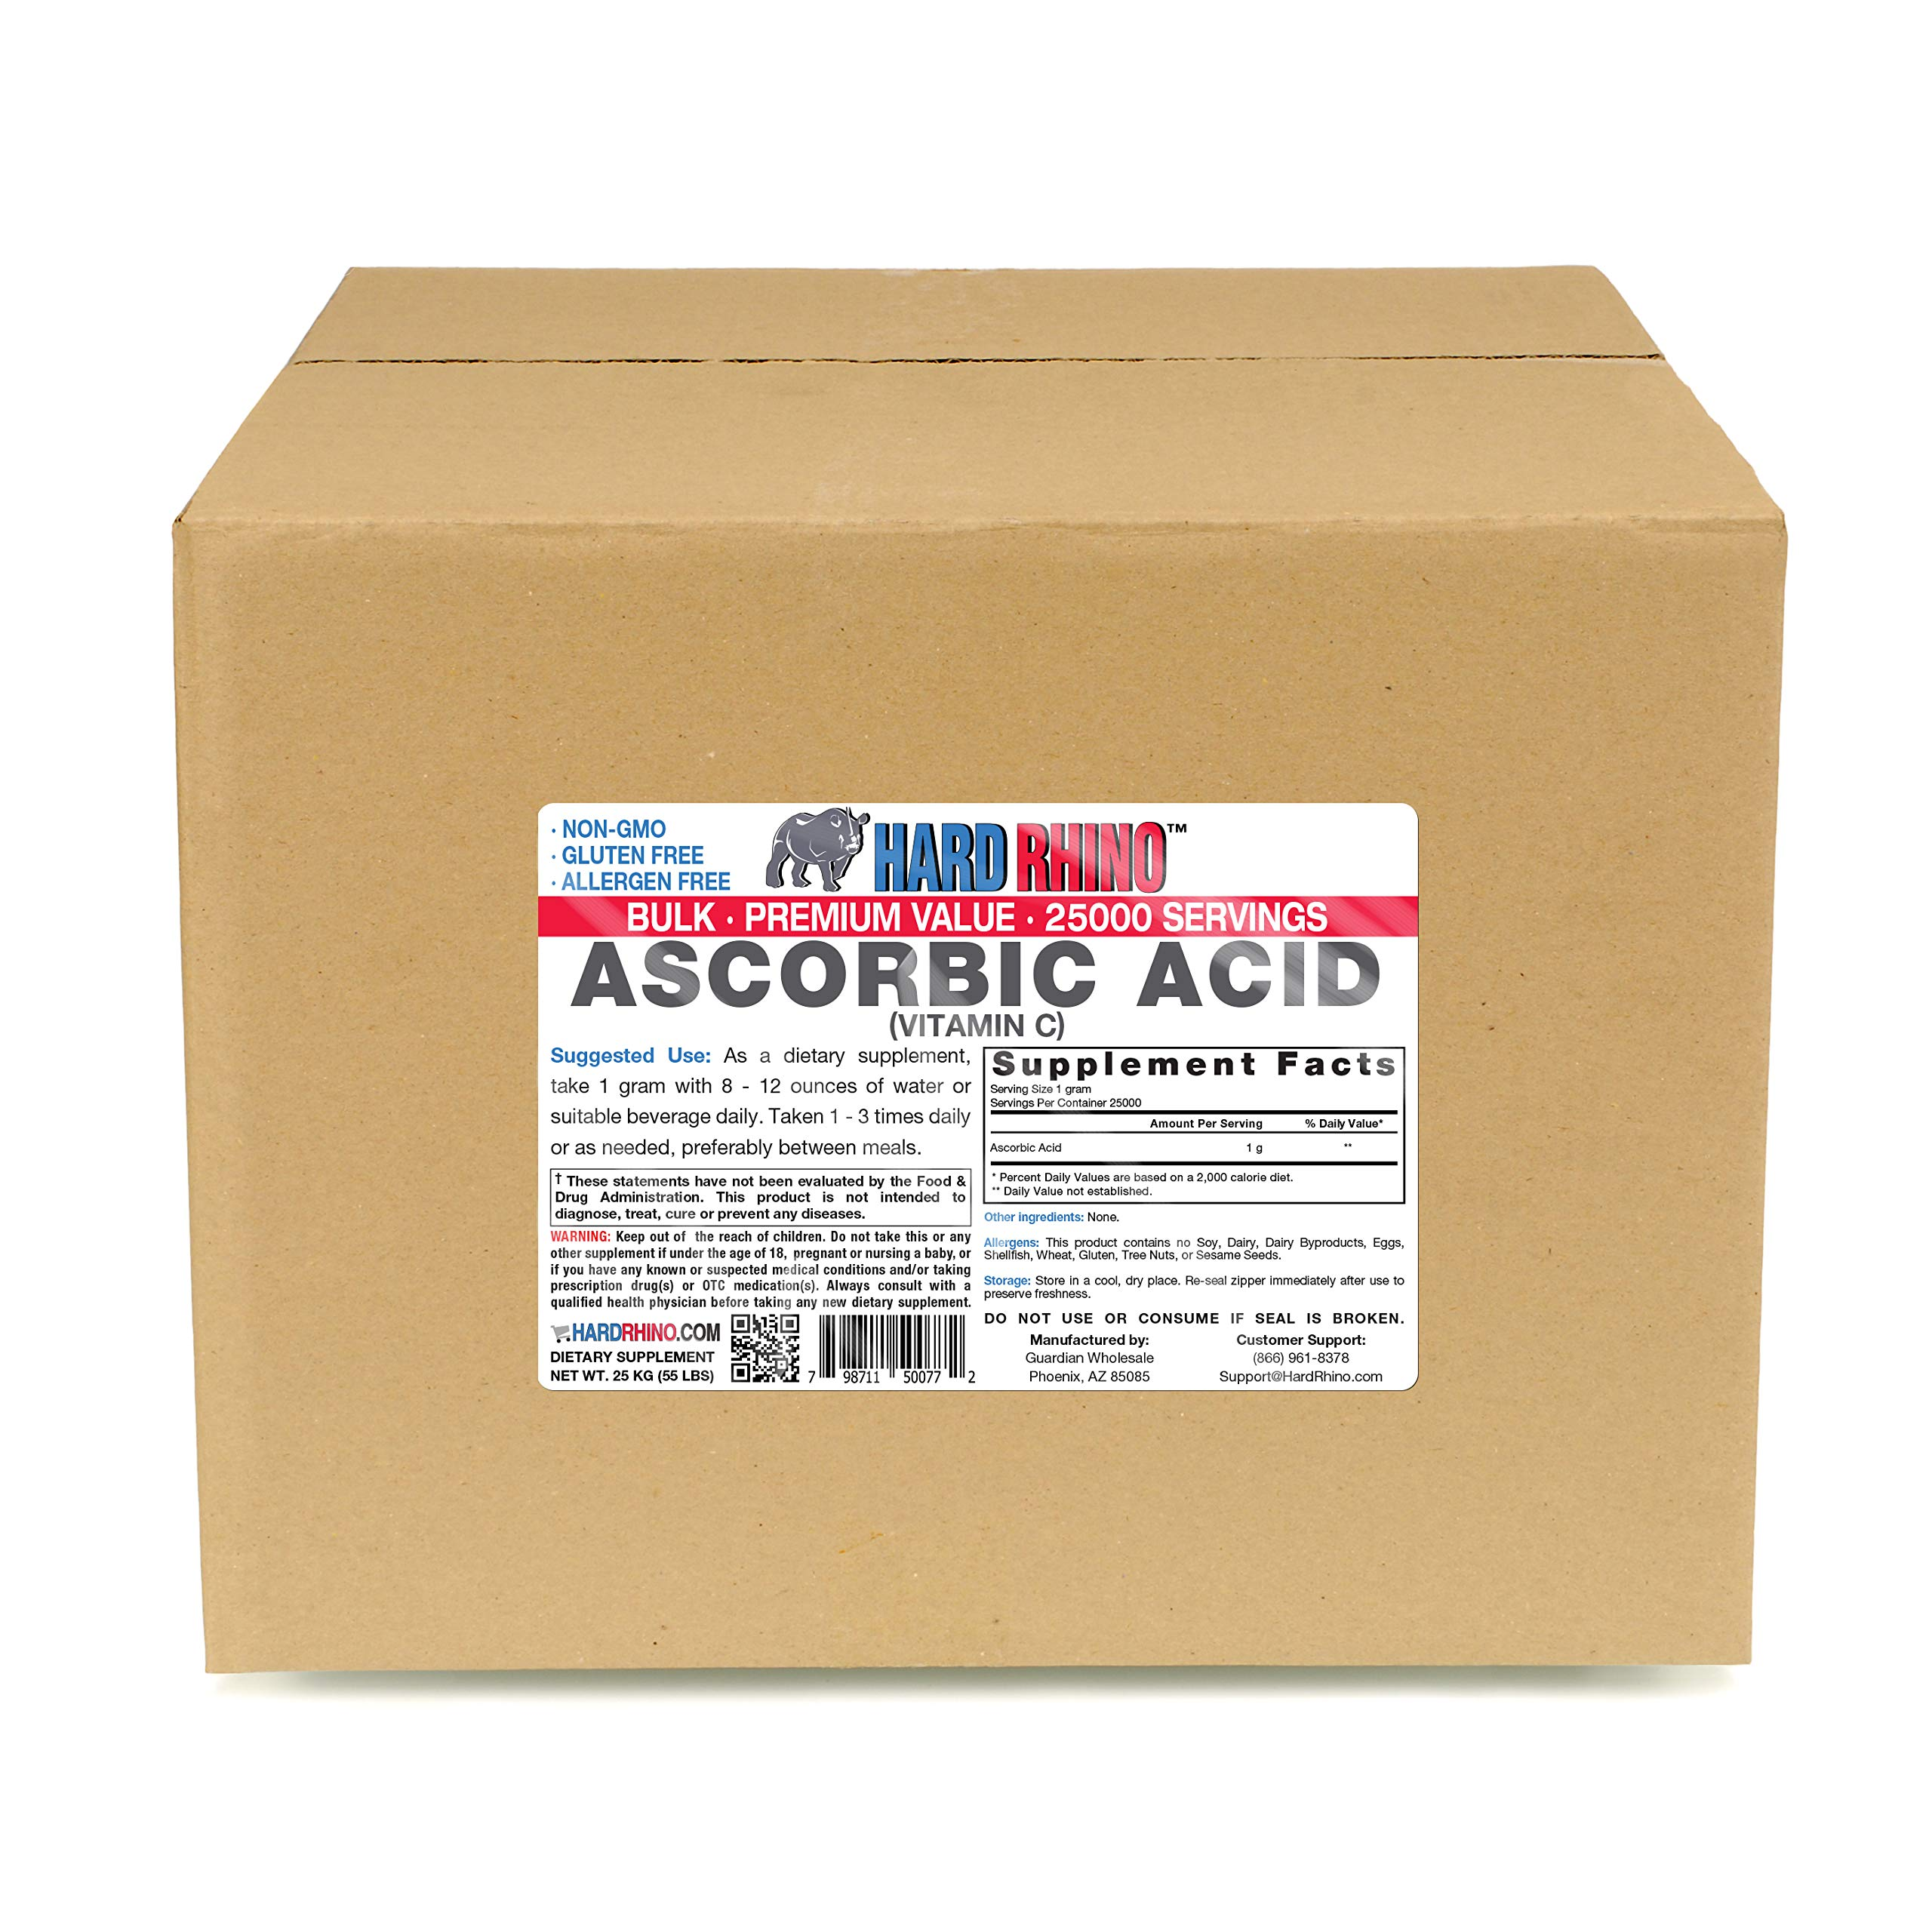 Hard Rhino Ascorbic Acid (Vitamin C) Powder, 25 Kilograms (55 Lbs), Unflavored, Lab-Tested